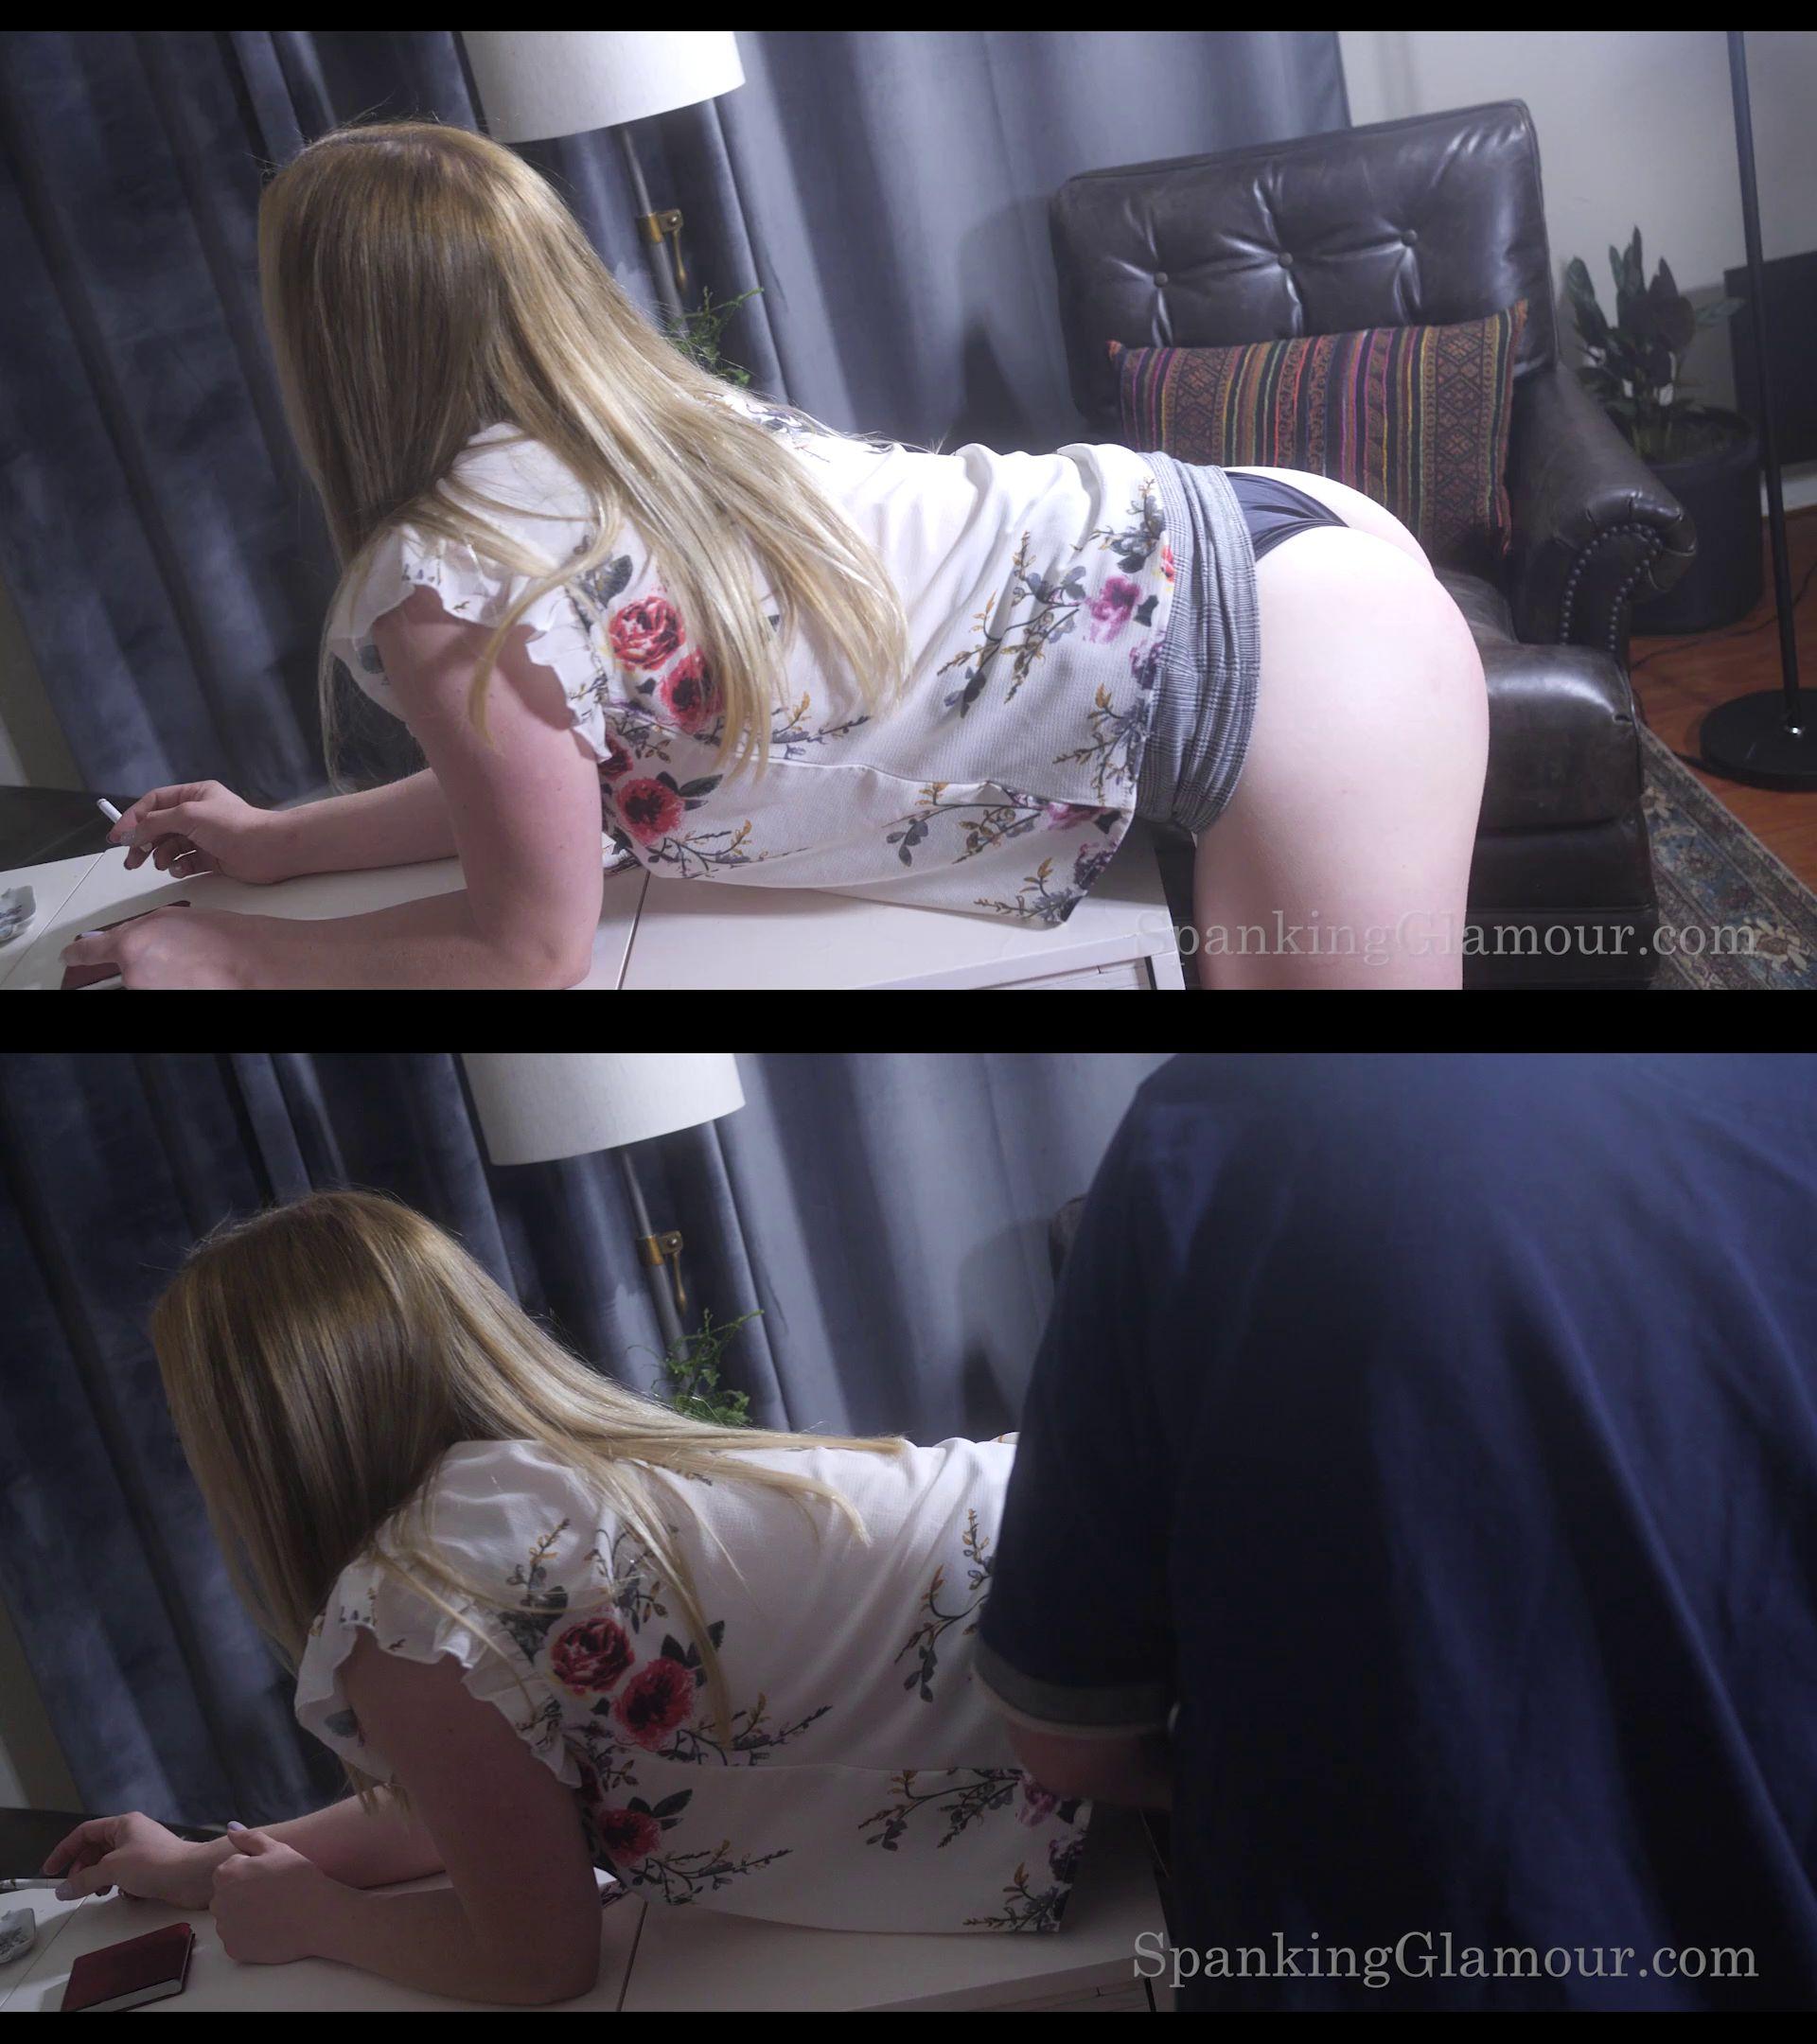 spankingglamor – MP4/HD – Lindsay Lee – Lindsay Lee 1